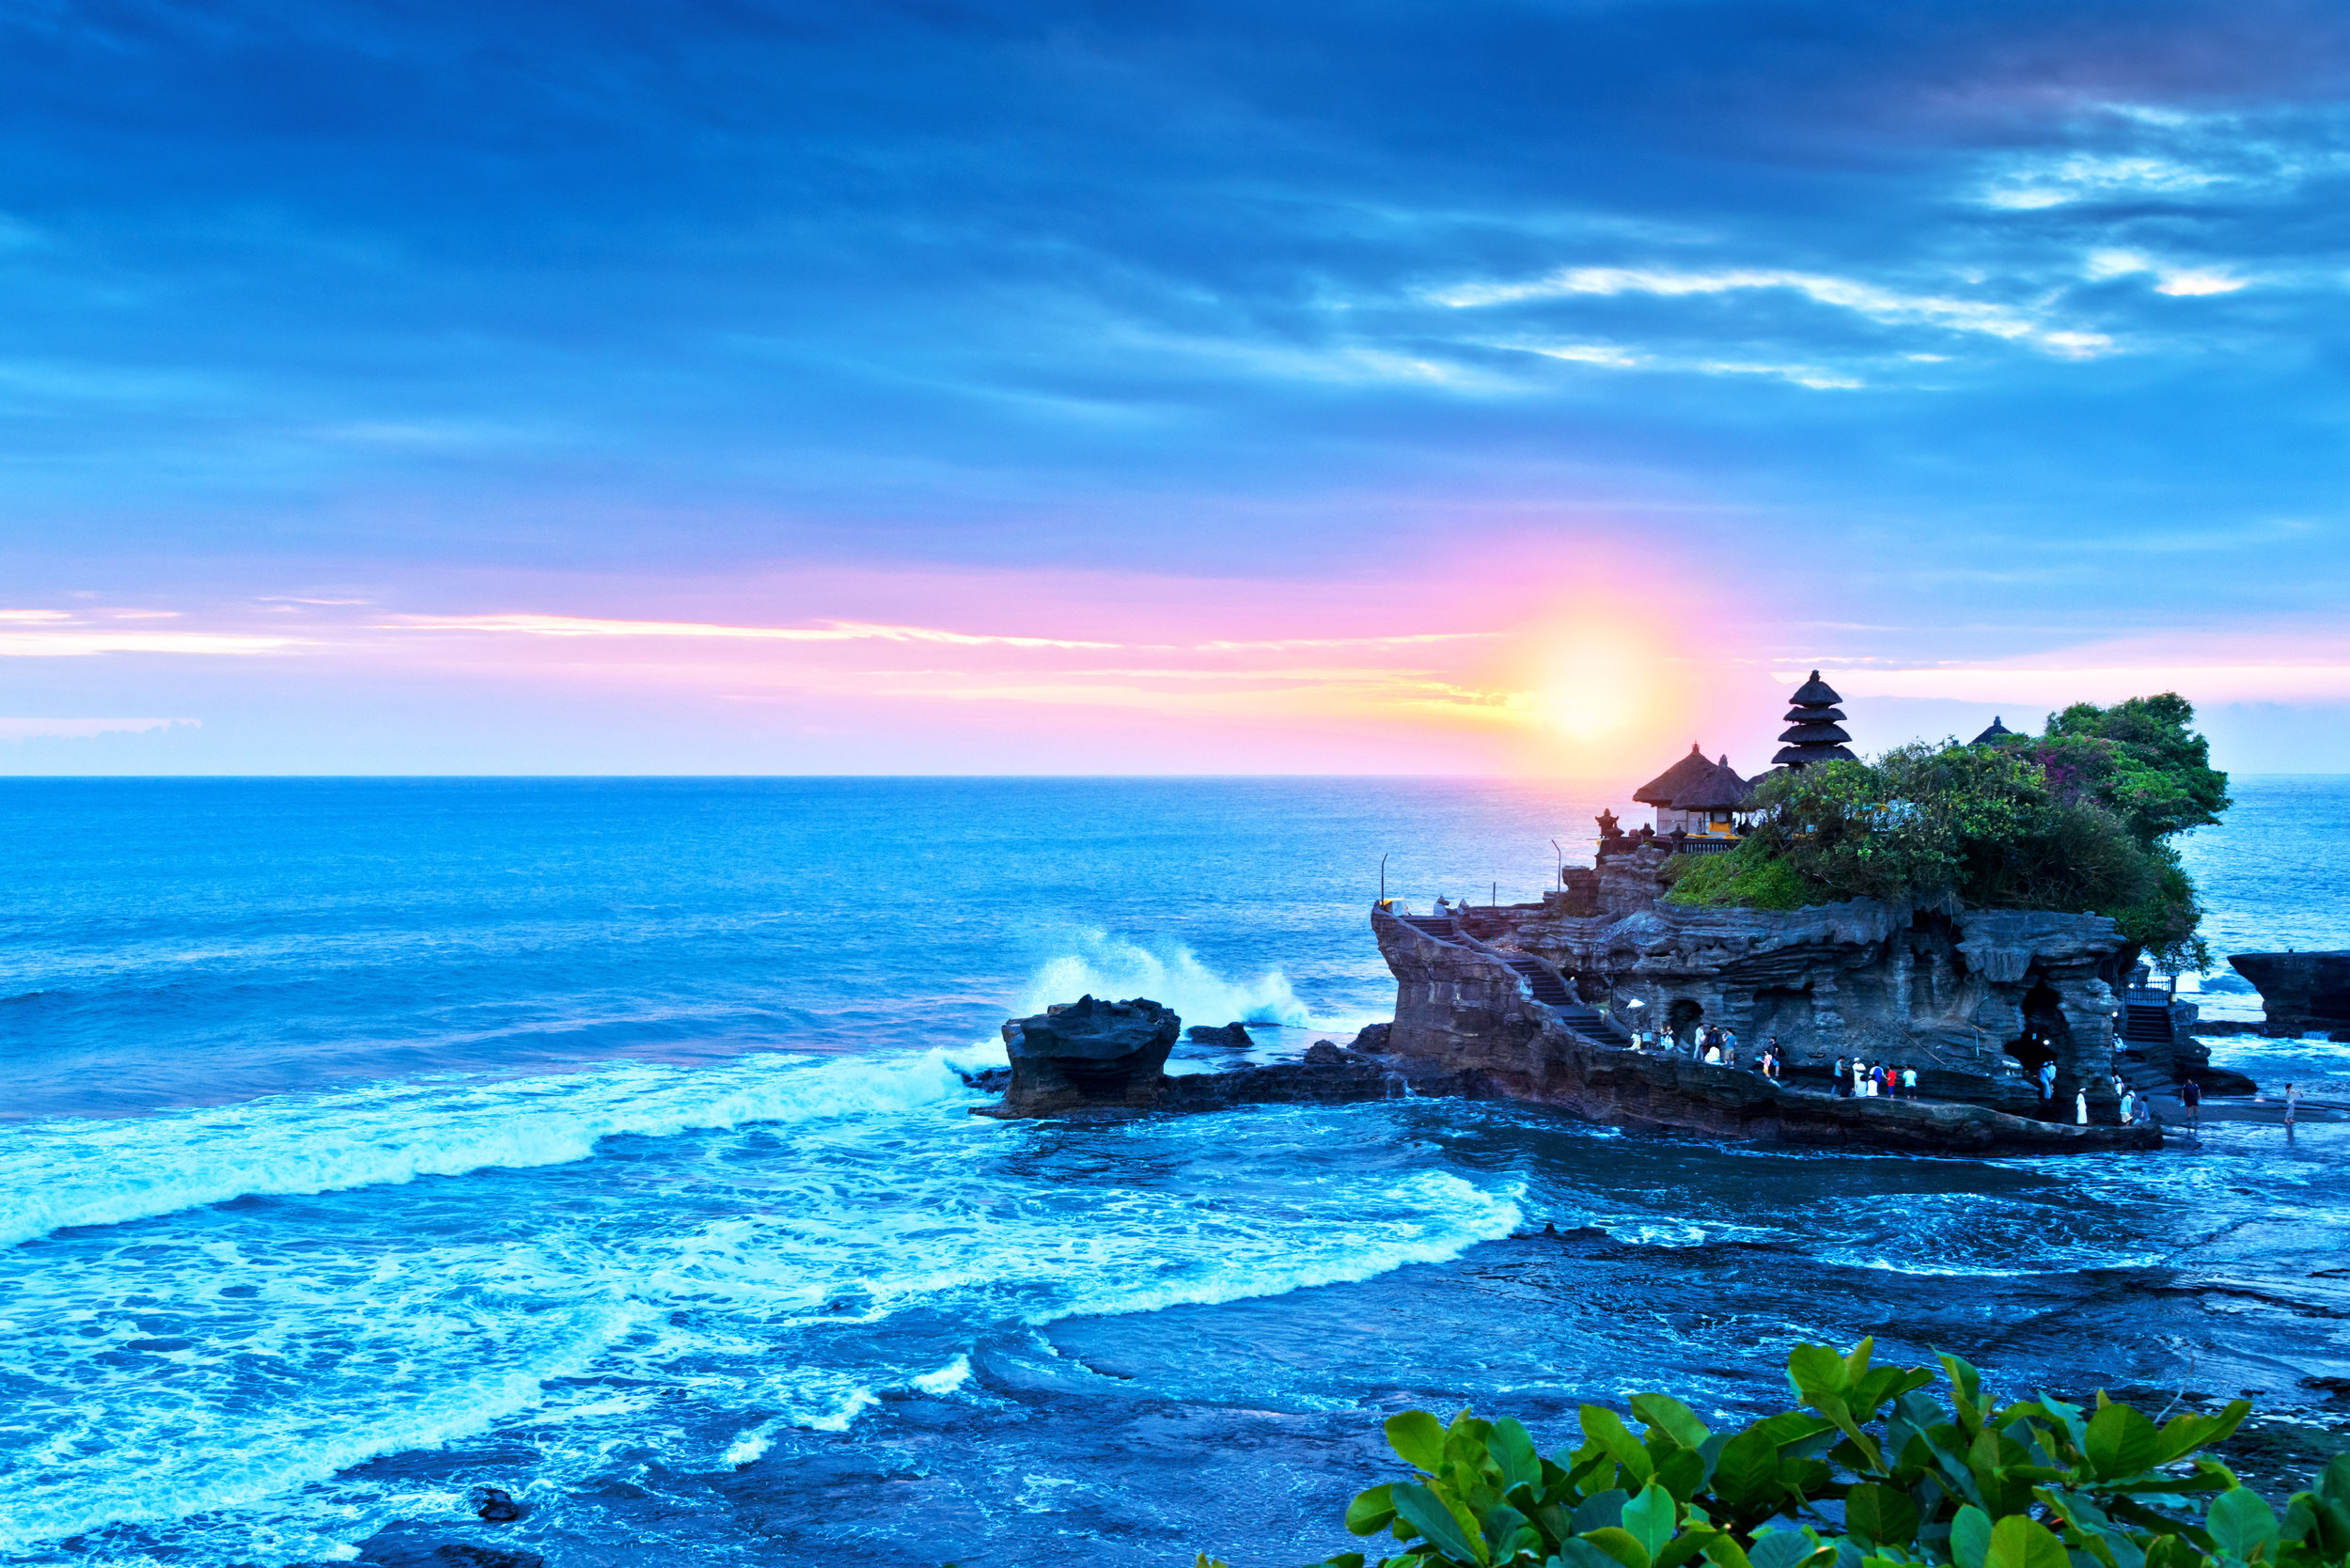 Bali_Beach_Temple.jpg